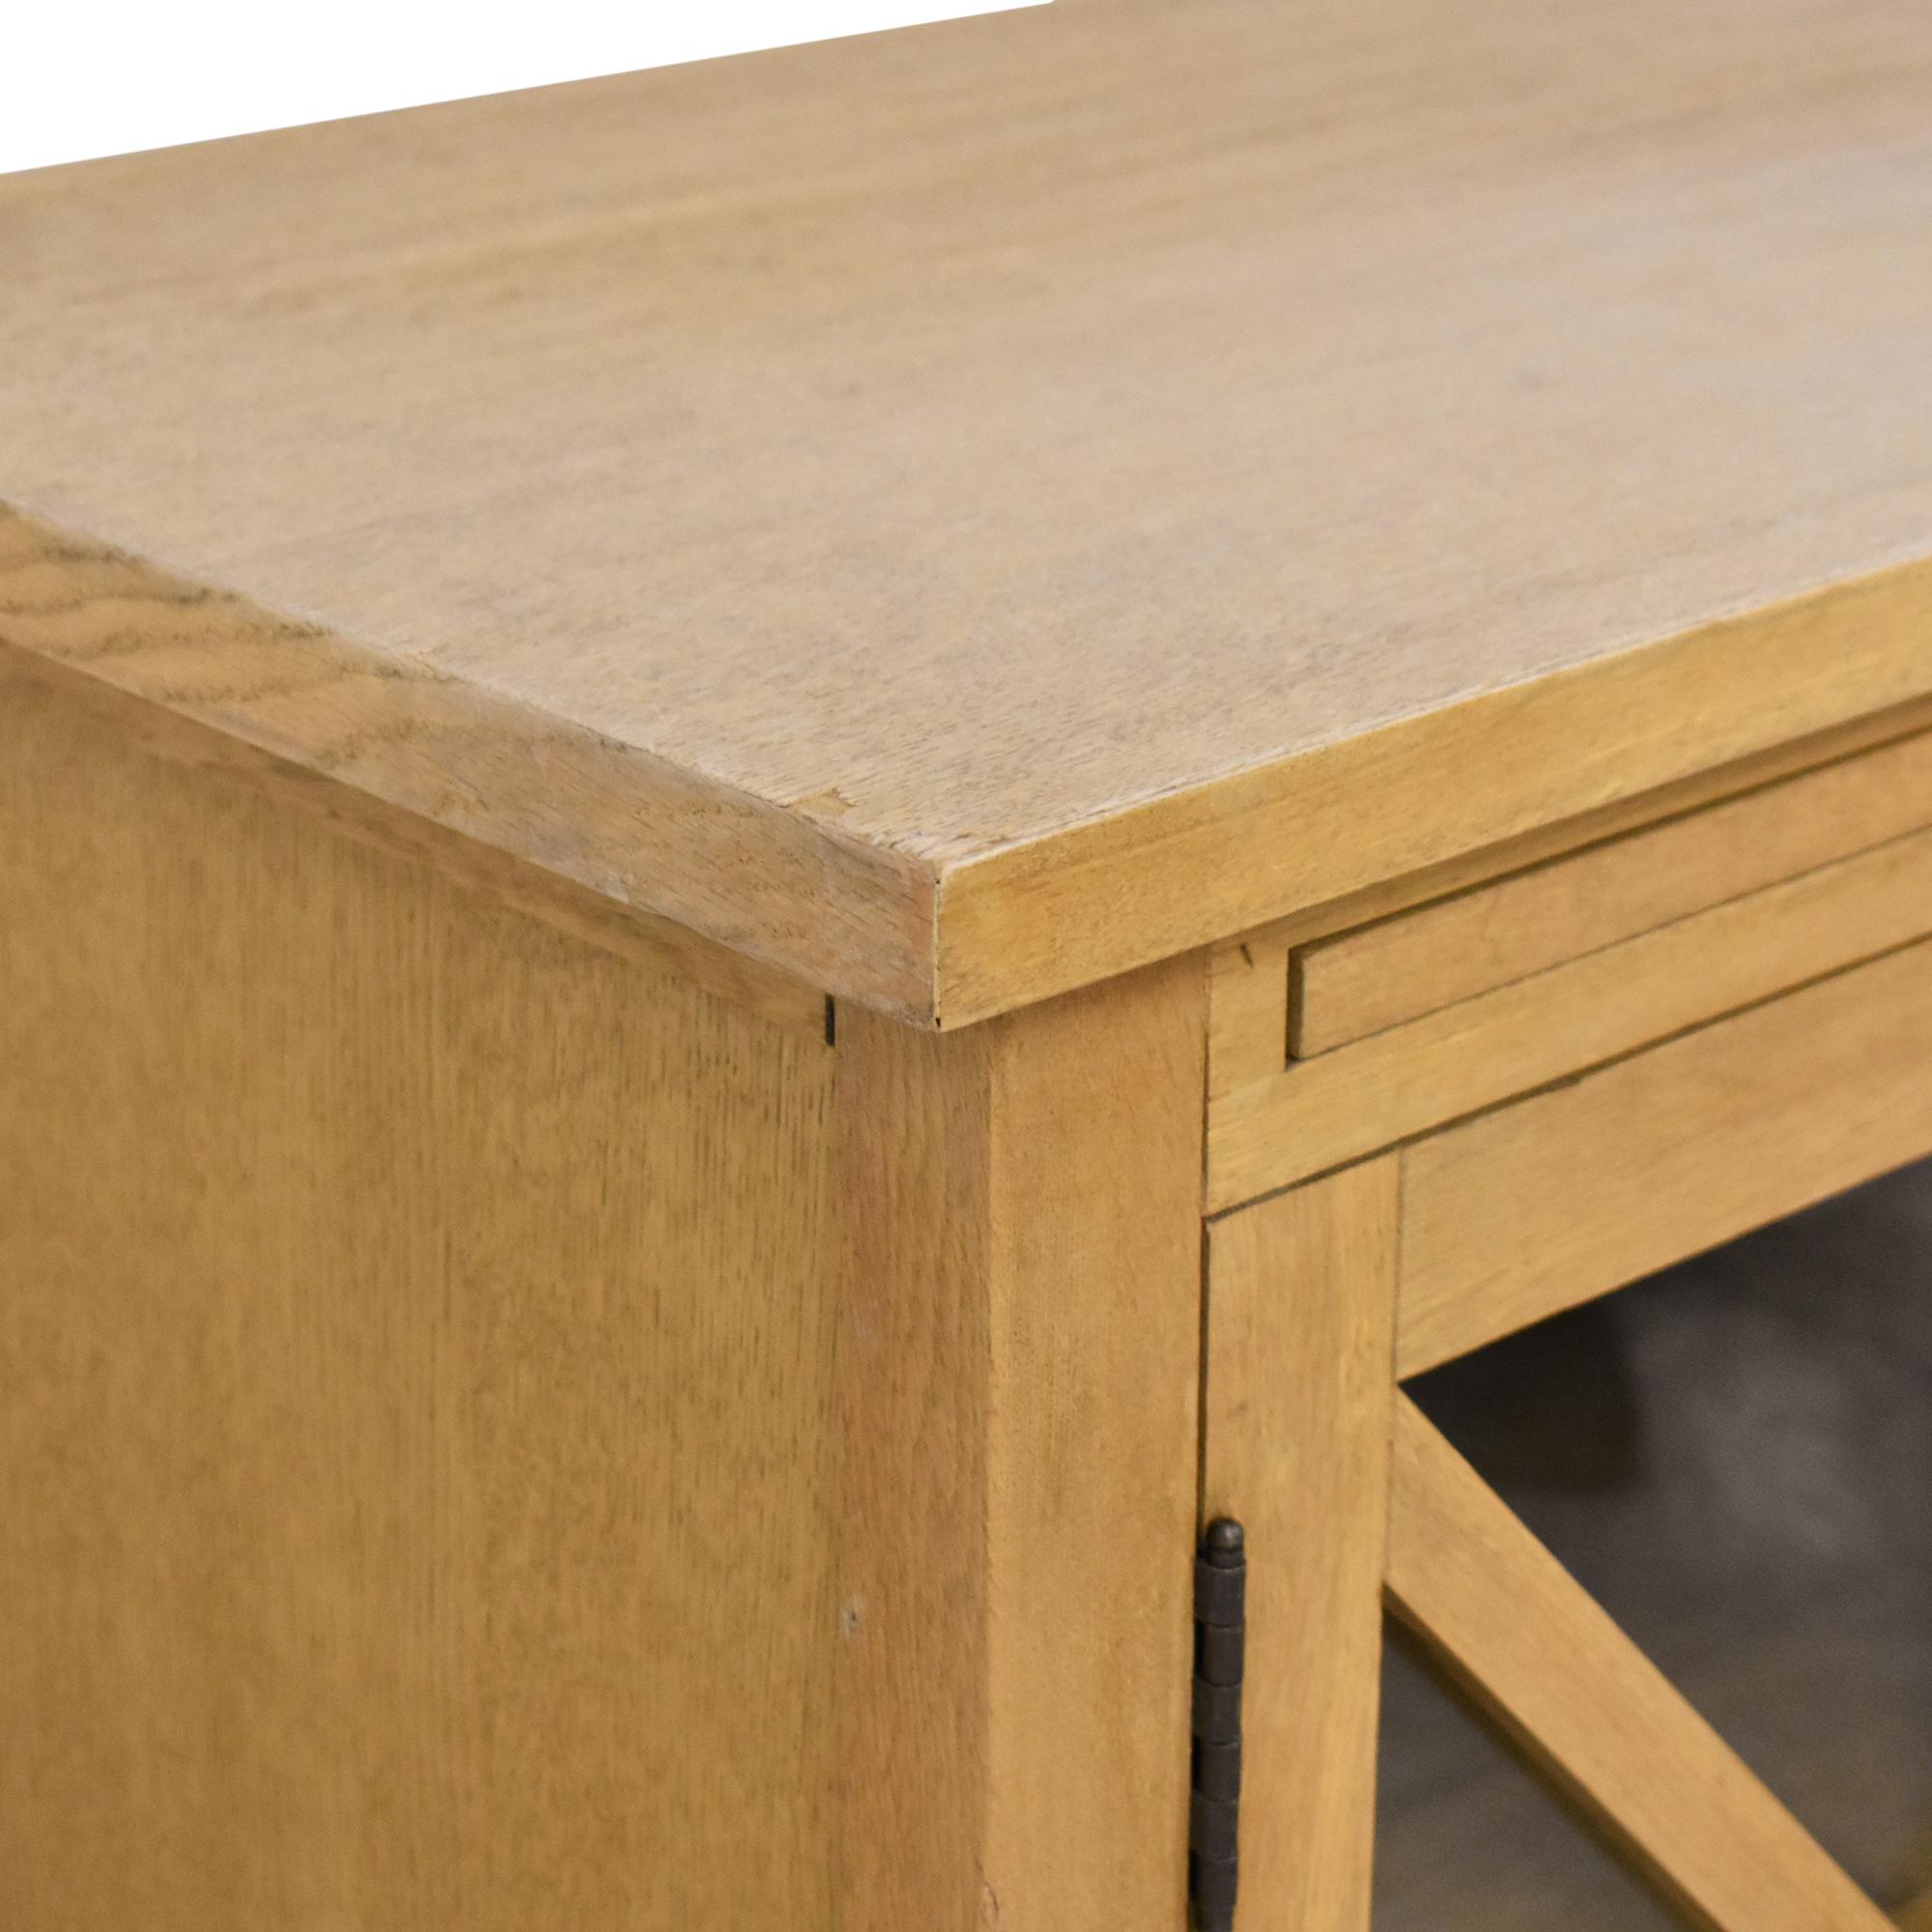 buy Ballard Designs Belgard Console Ballard Designs Cabinets & Sideboards